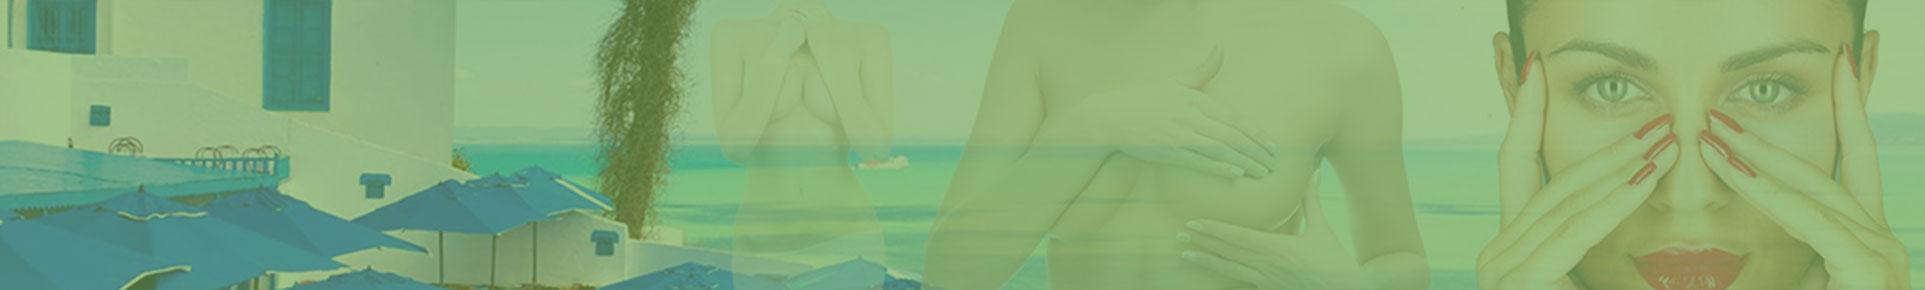 lifting mammaire tunisie tout compris correction pt se mammaire. Black Bedroom Furniture Sets. Home Design Ideas